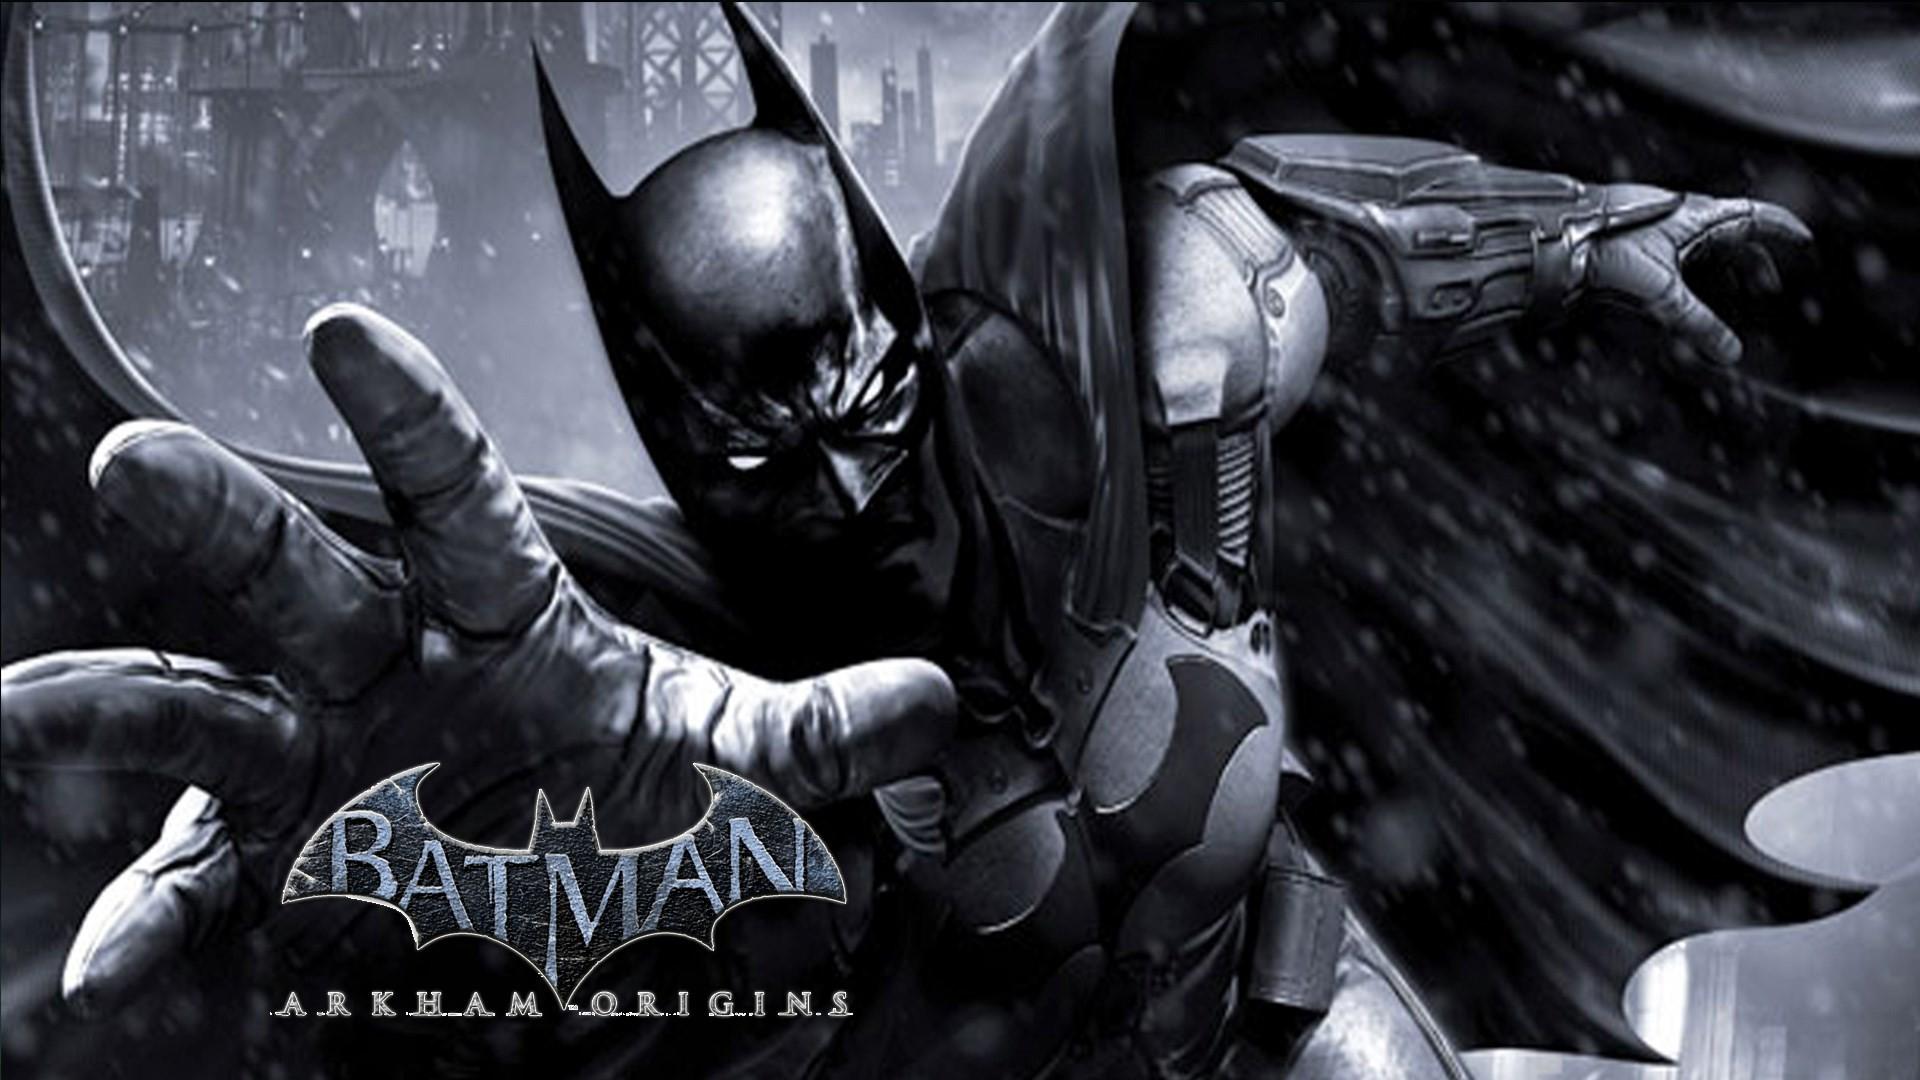 free screensaver wallpapers for batman arkham origins – batman arkham  origins category